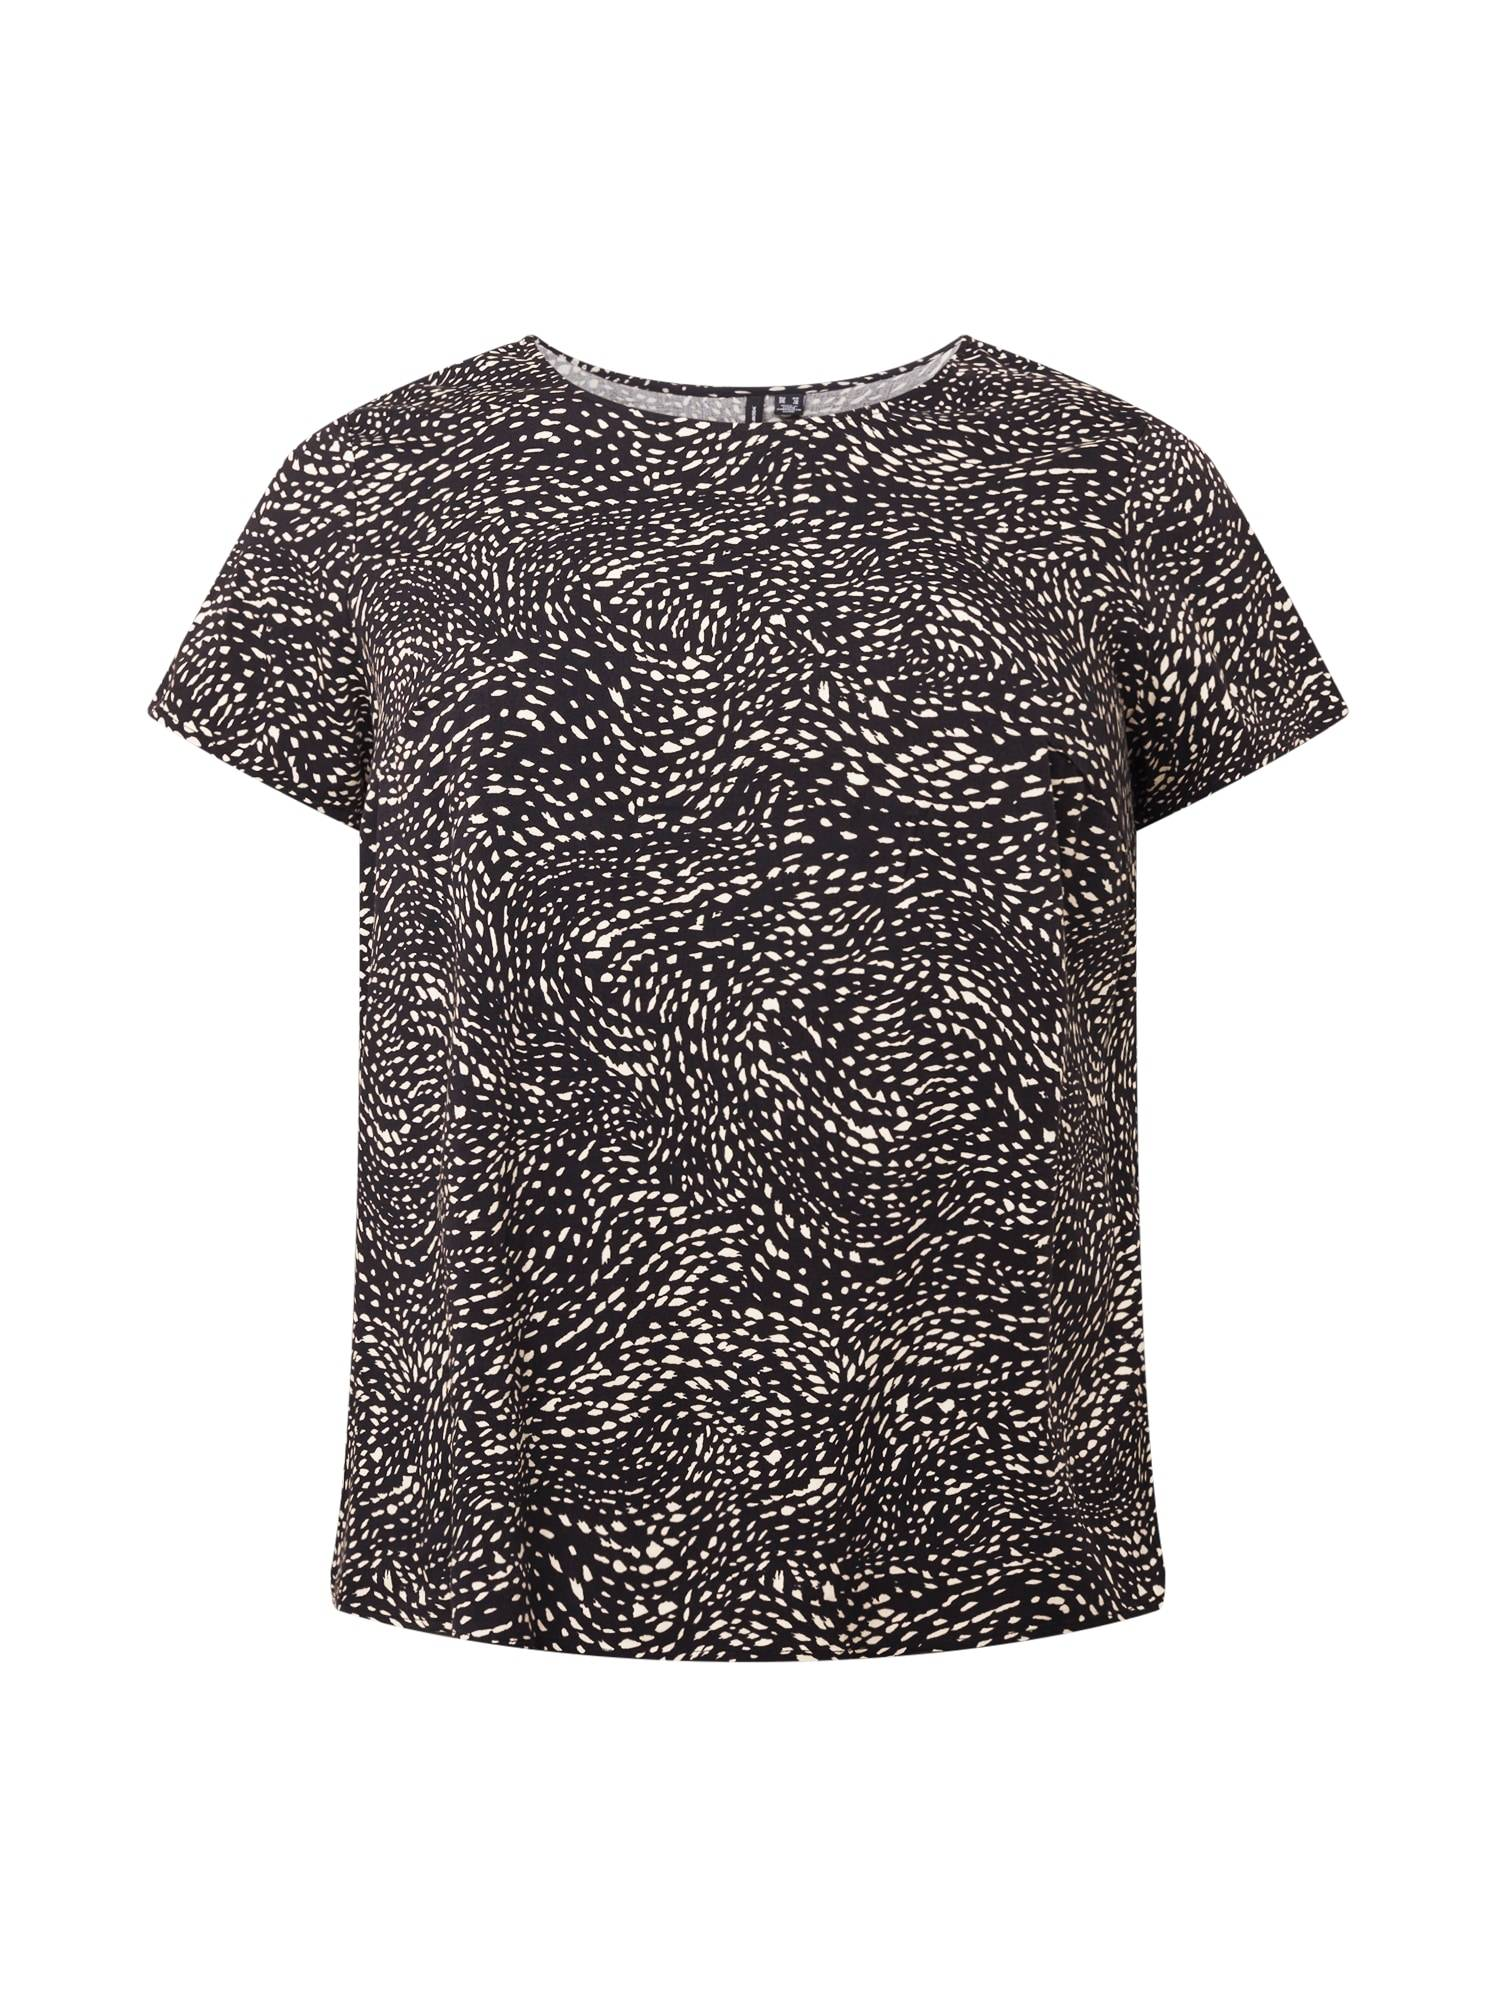 Vero Moda Curve T-shirt 'BACA'  - Noir - Taille: 48 - female